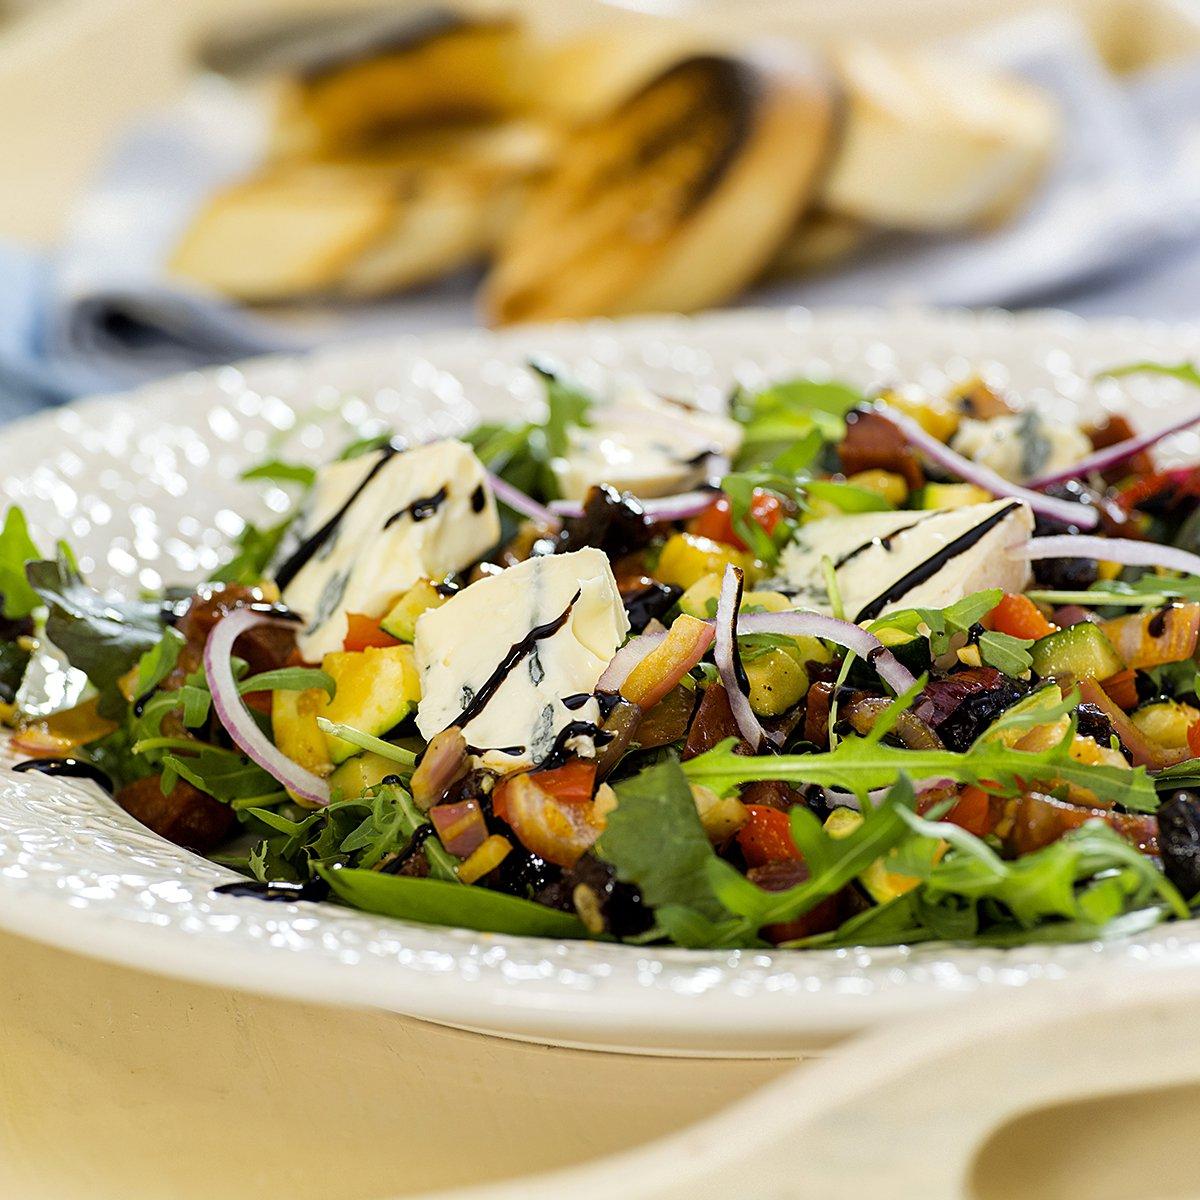 Deilig rustikk salat